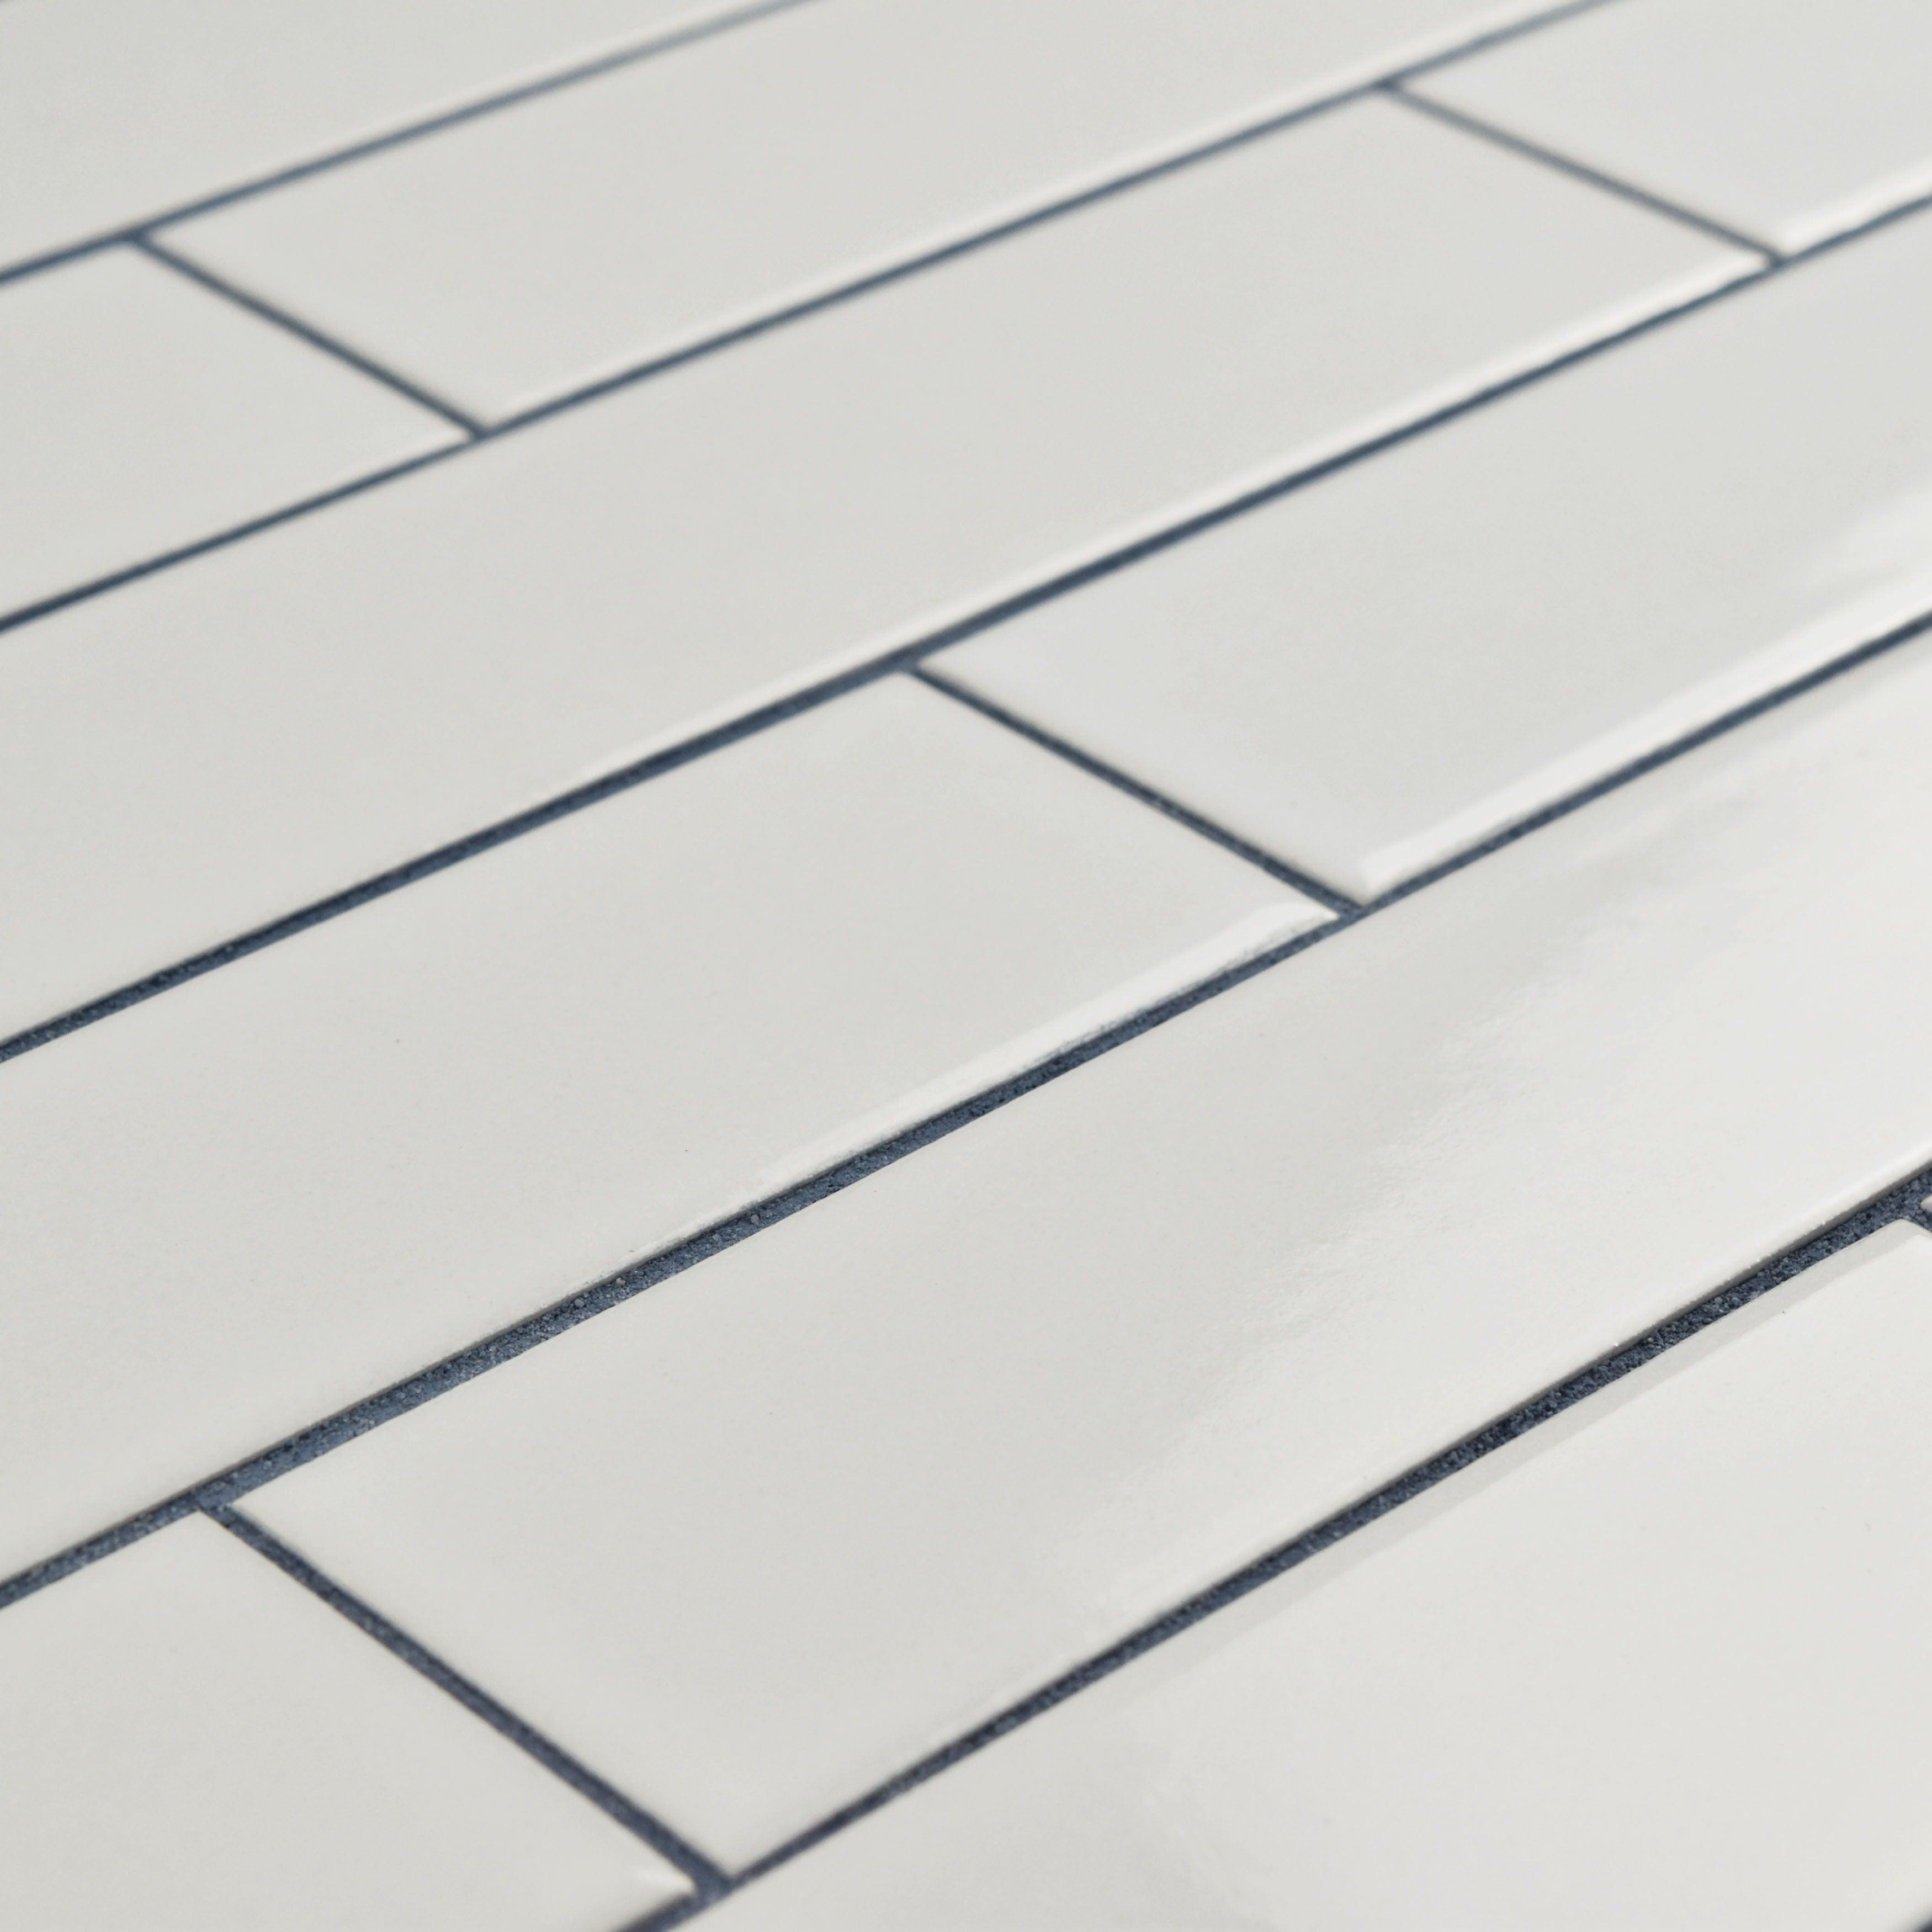 Somertile victorian soho subway white porcelain tiles case of 100 somertile victorian soho subway white porcelain tiles case of 100 free shipping today overstock 14091715 dailygadgetfo Gallery